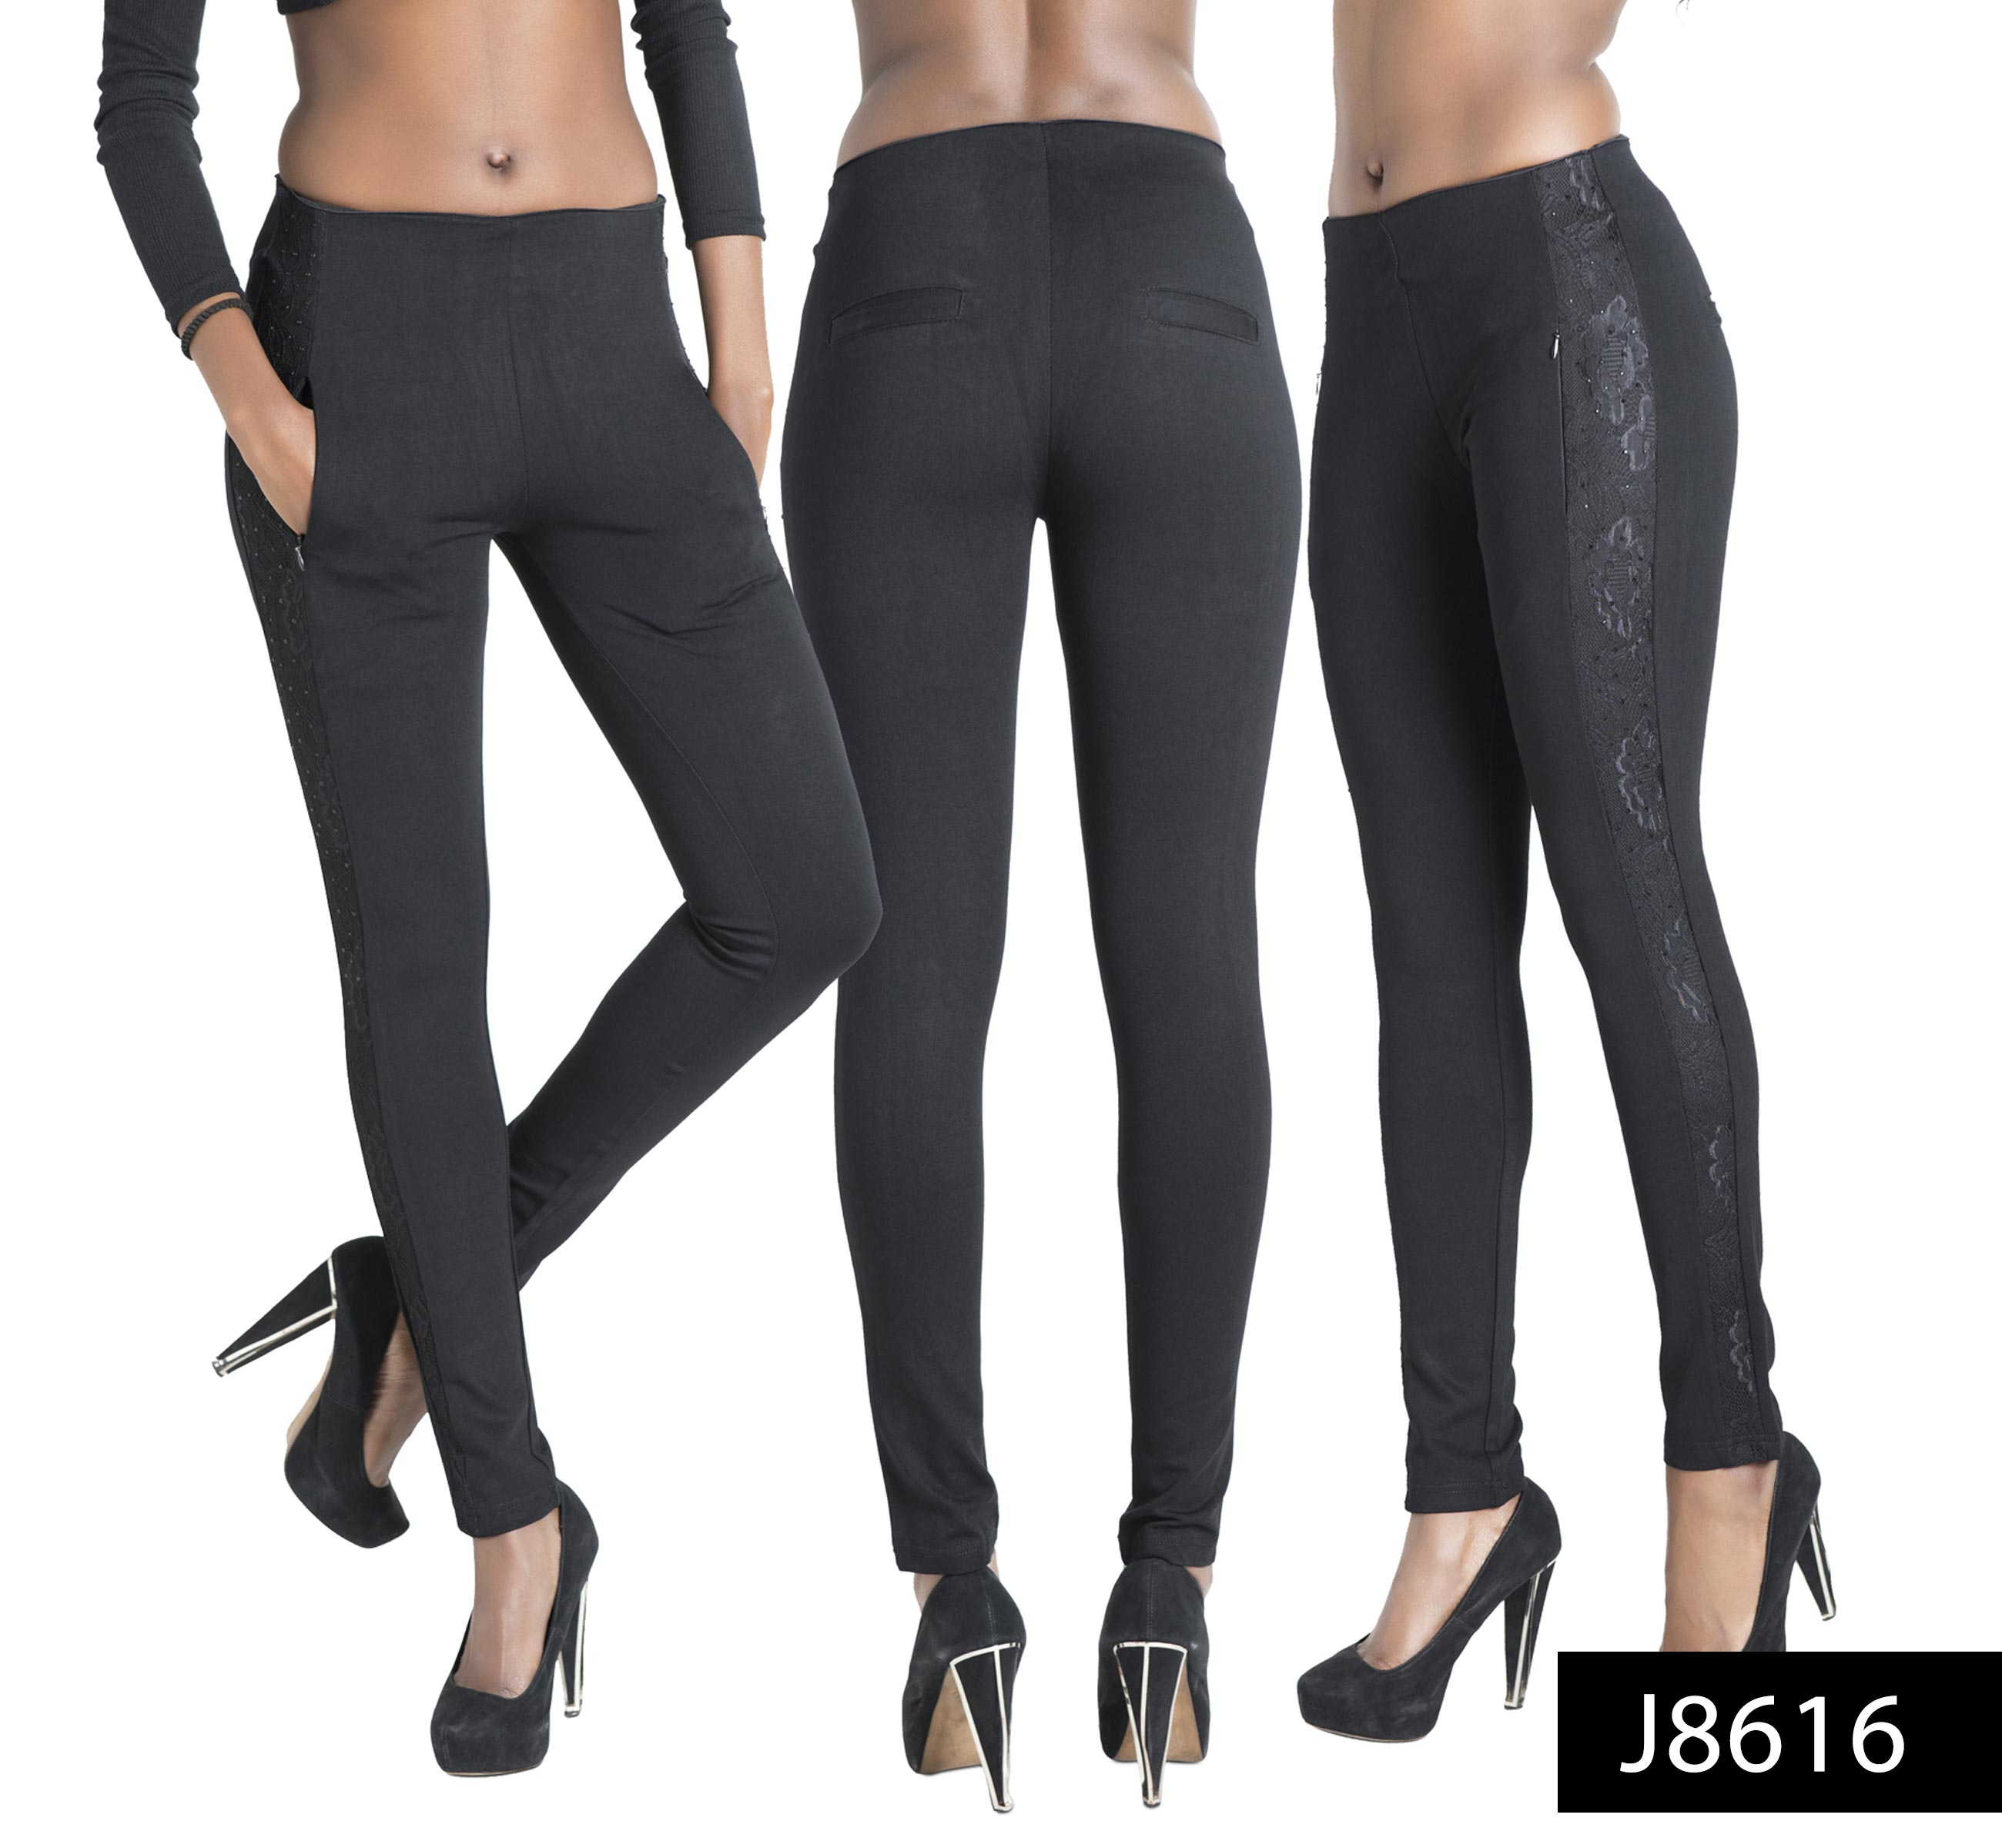 SALE Ladies Womens New Black Leather Look Sexy Leggings ...